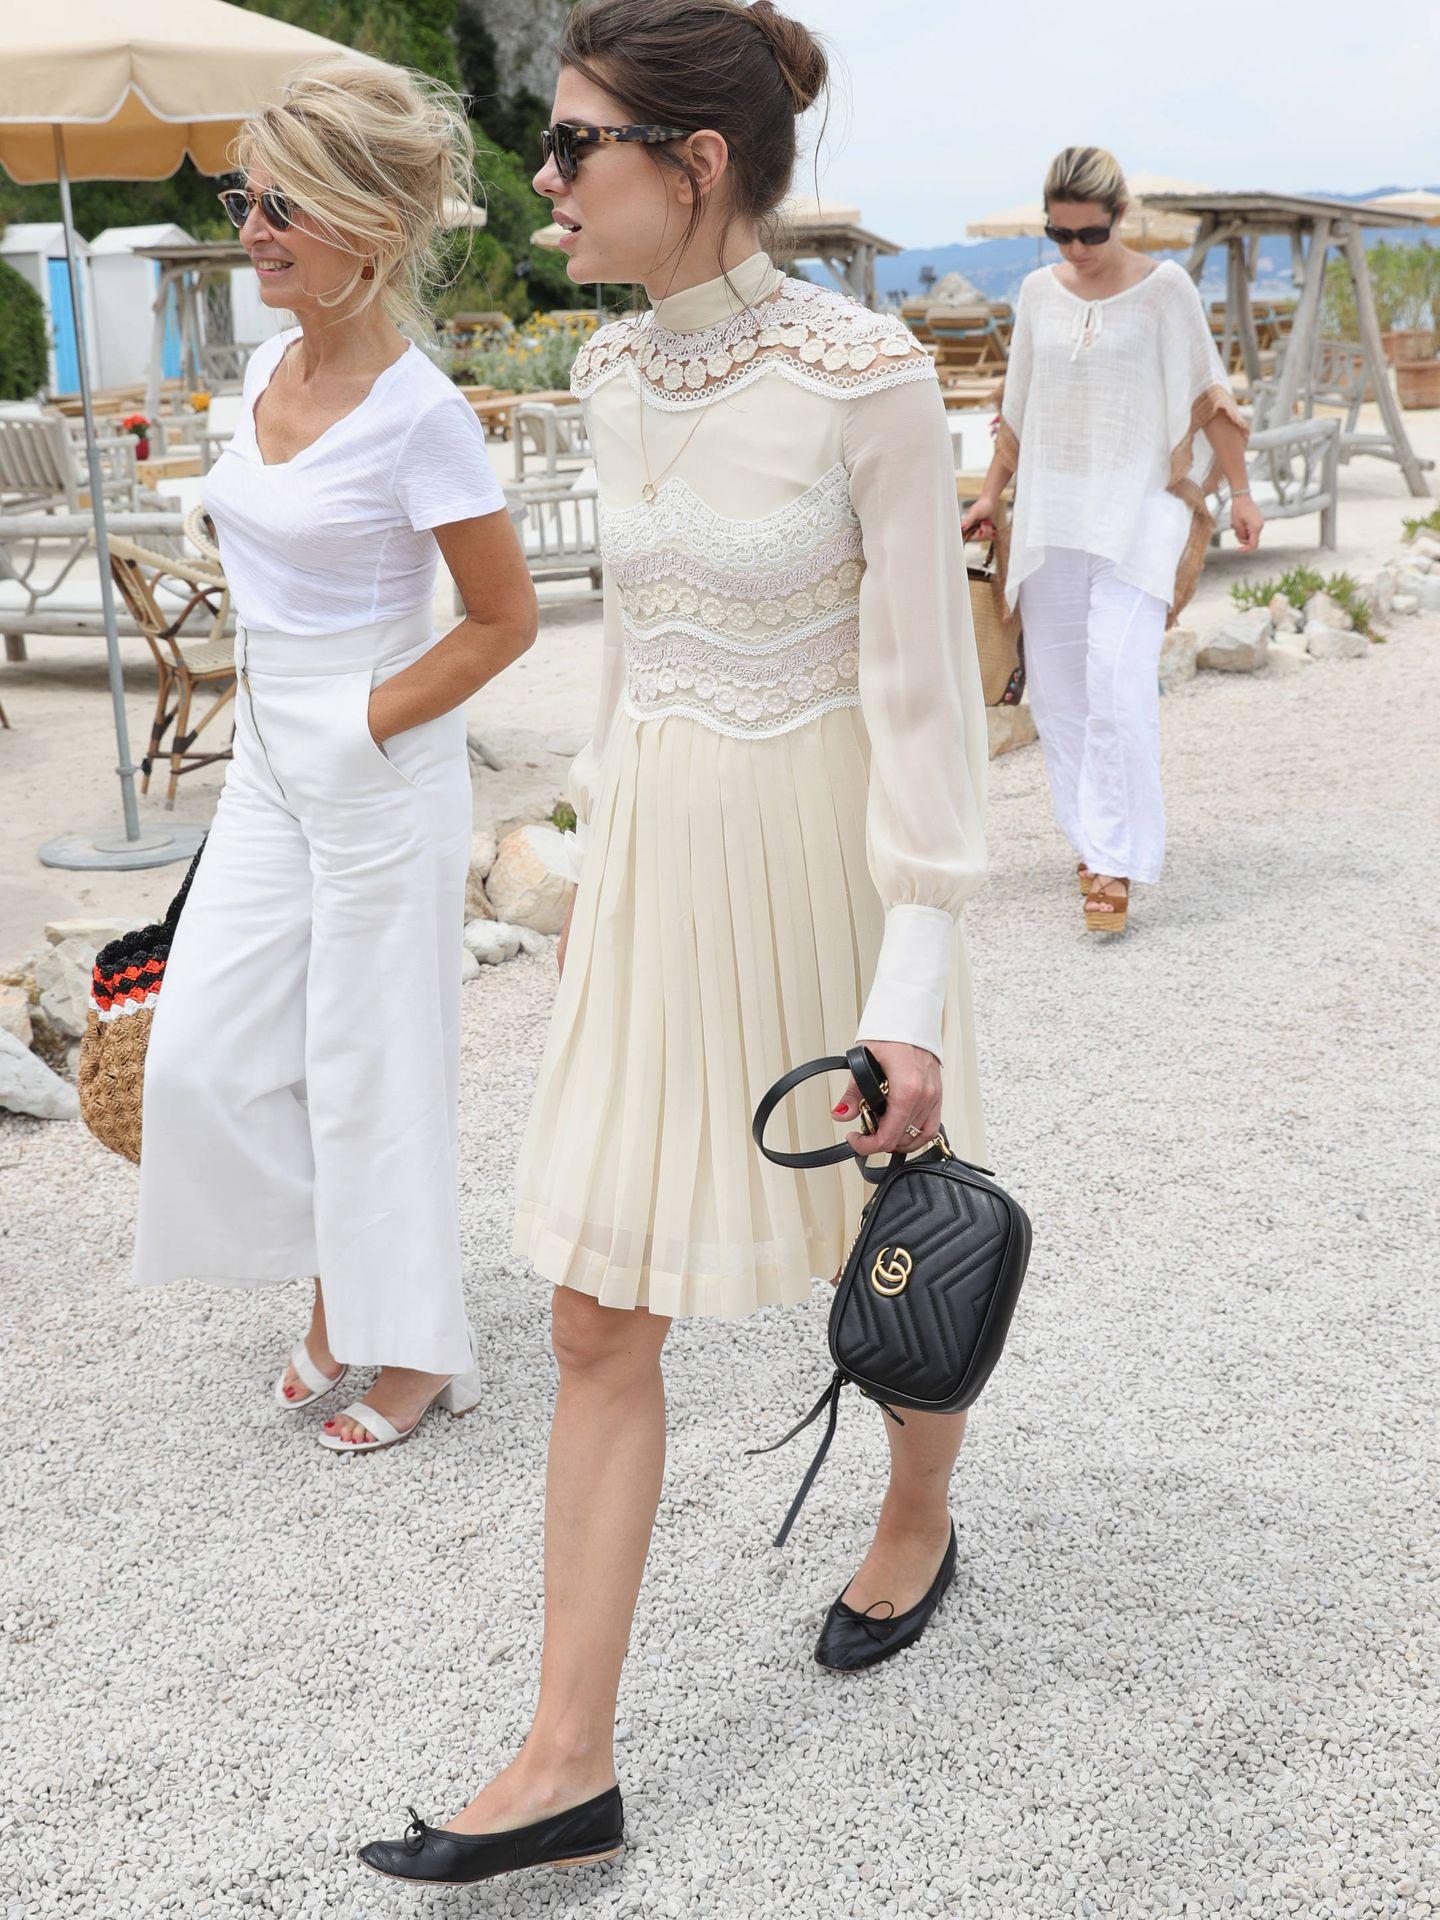 Carlota Casiraghi en Cannes. (Getty)